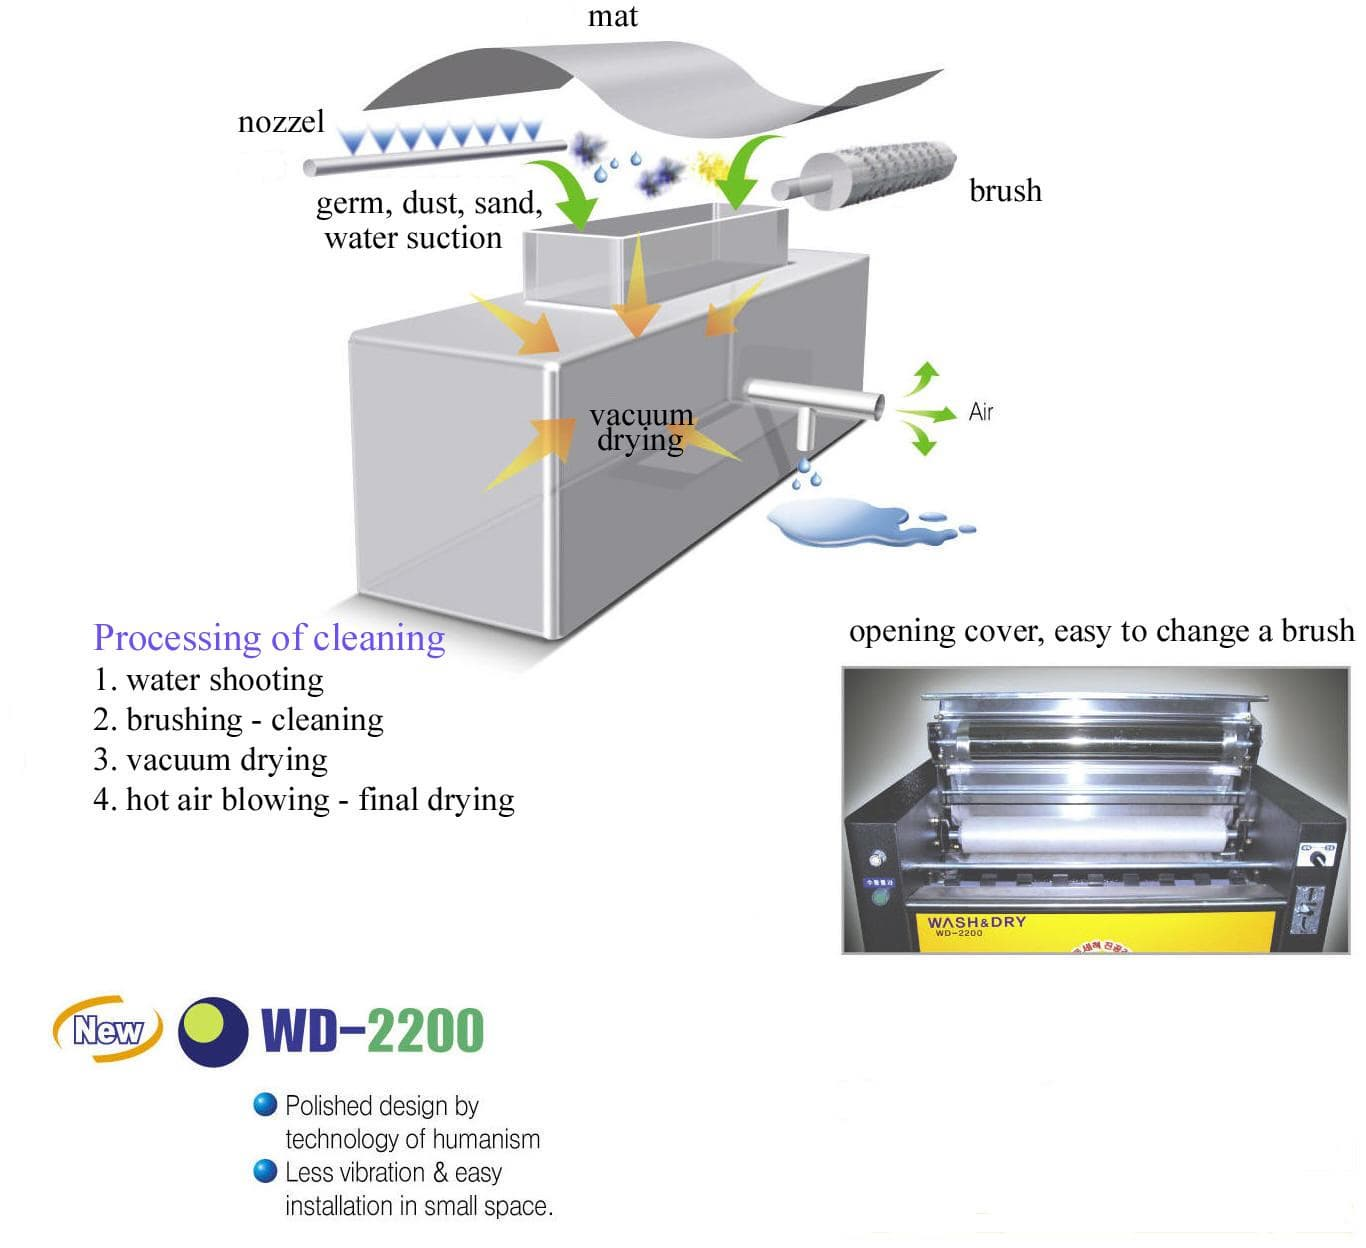 mat washing & drying machine -vacuum drying system & opening cover1.jpg